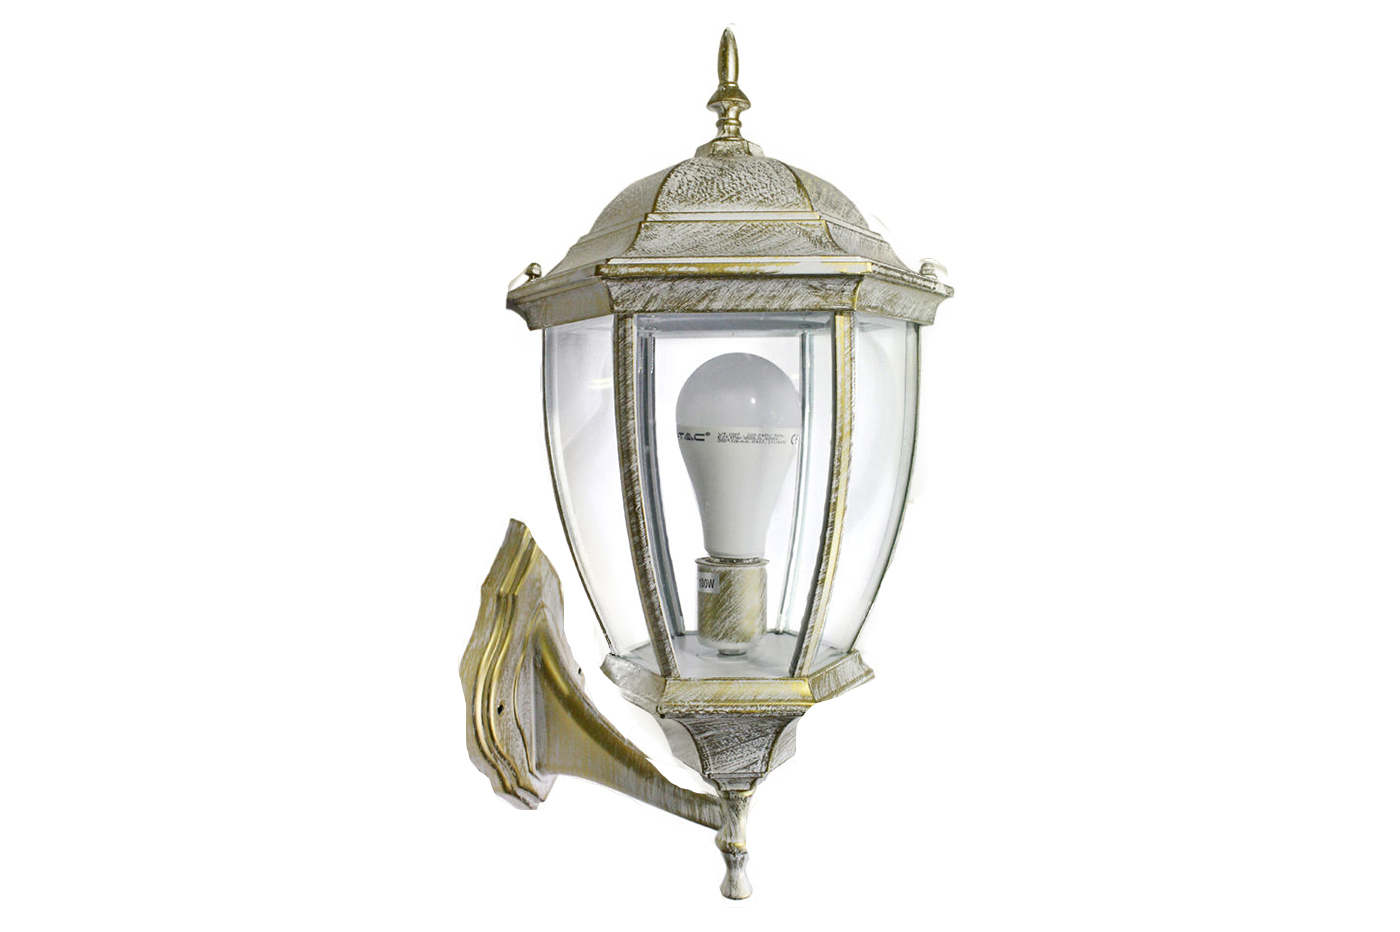 Lanterna Parete Esterno : Bes applique beselettronica applique lampada lanterna